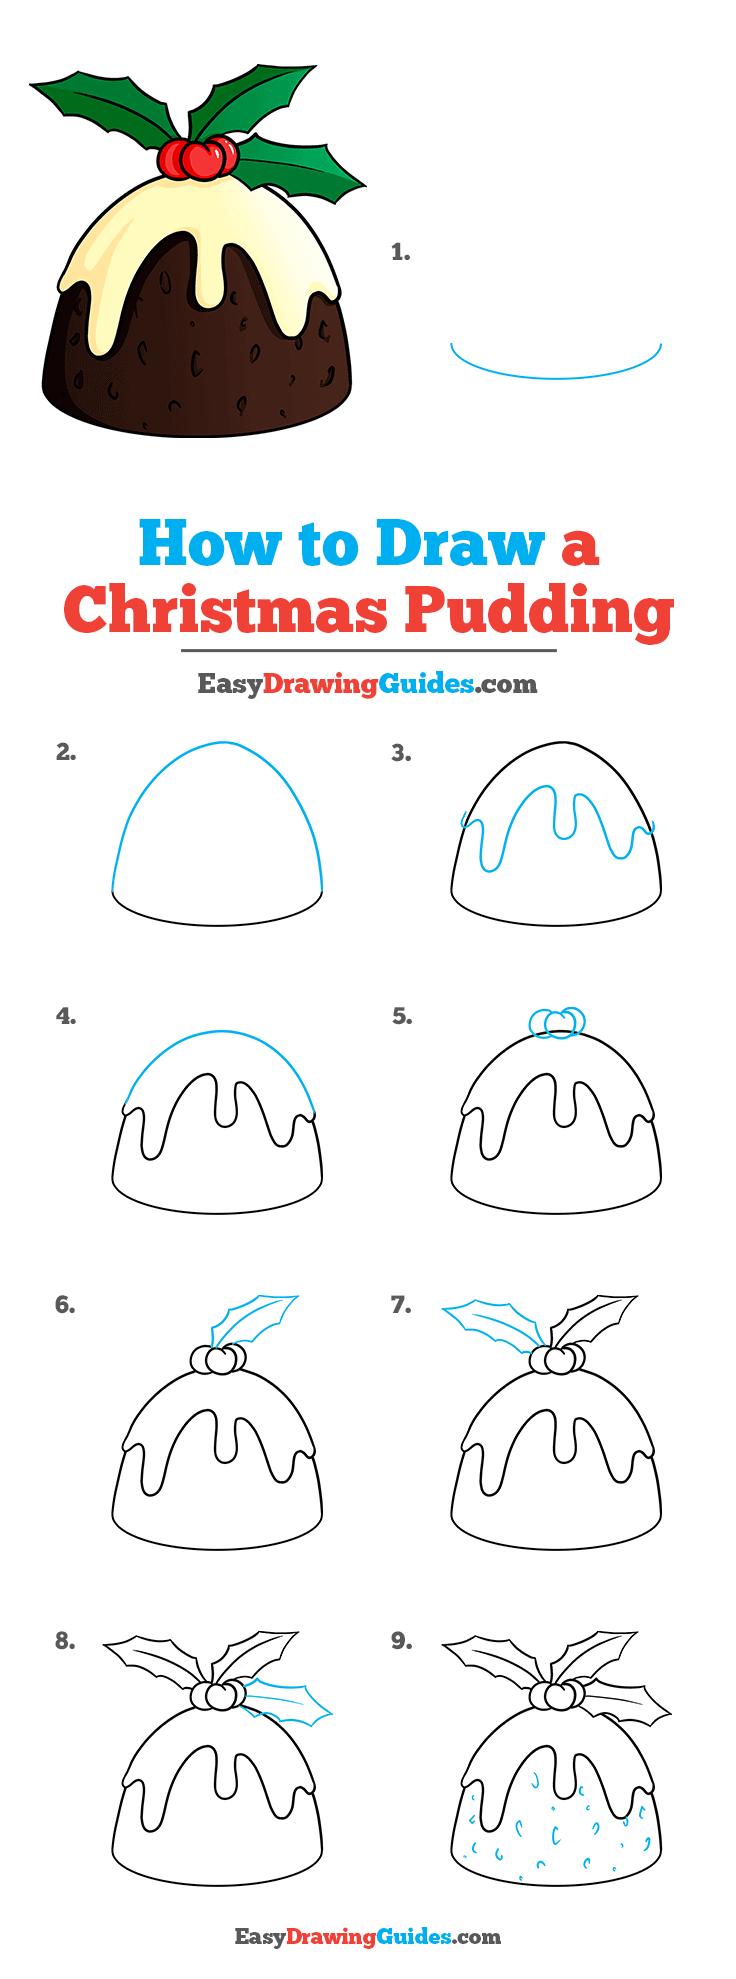 How to Draw Christmas Pudding